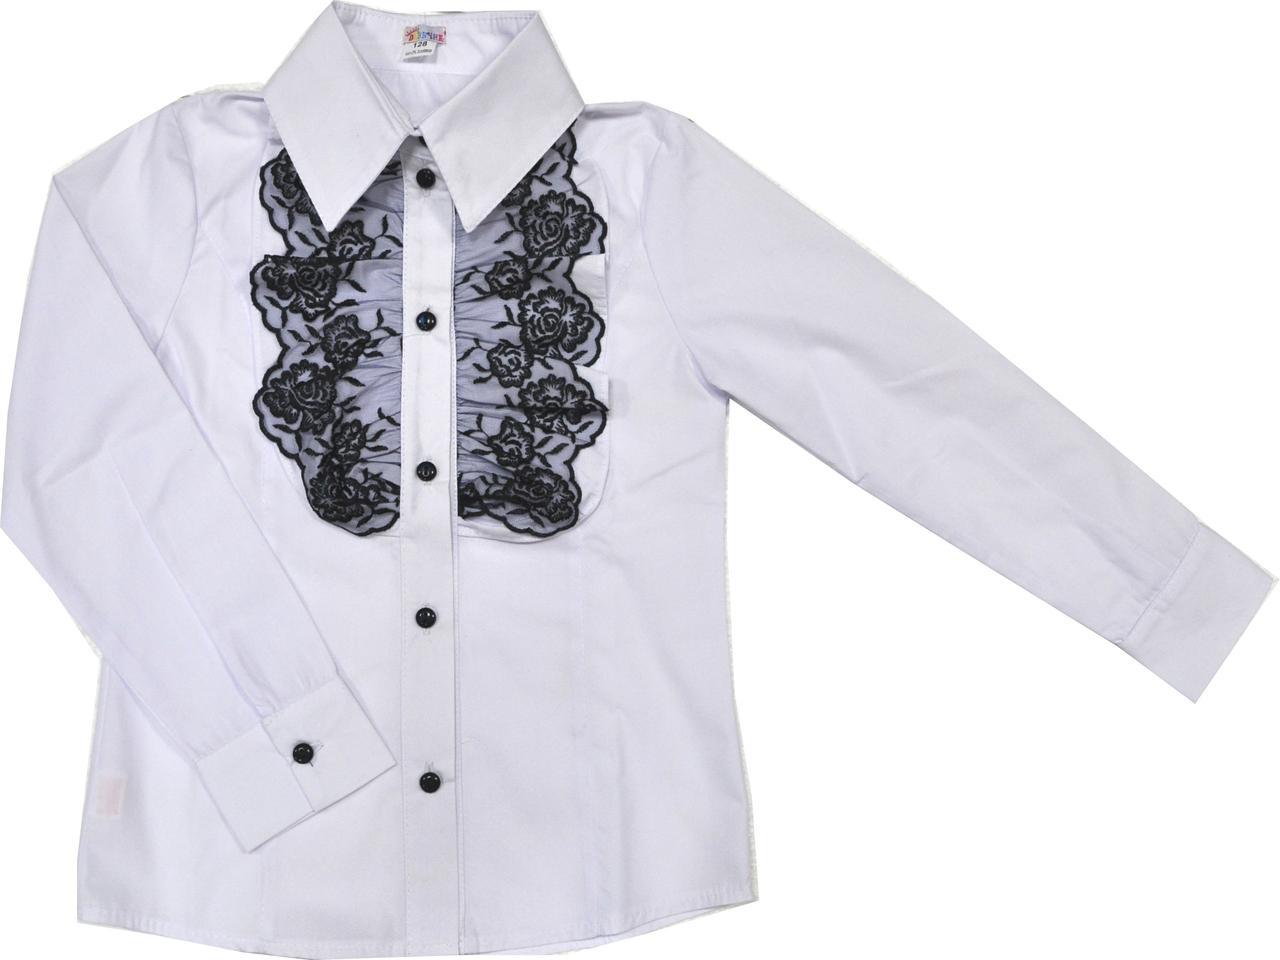 9d0d8934a05 Блузка детская для девочки  продажа